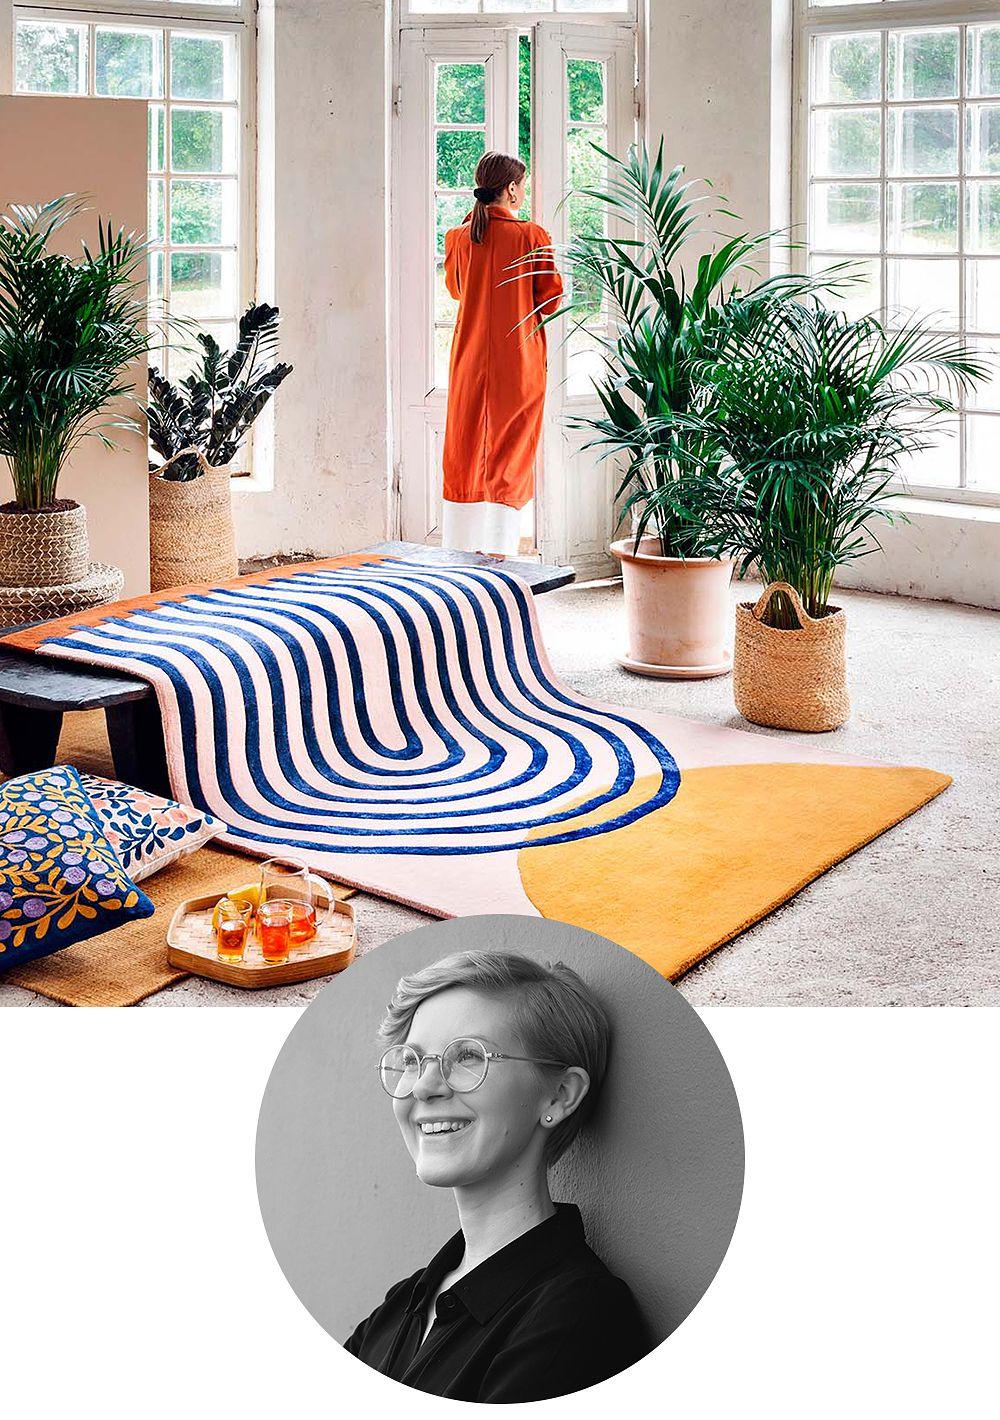 Designer Marianne Huotari featuring the Atrium rug she has designed for Finarte.